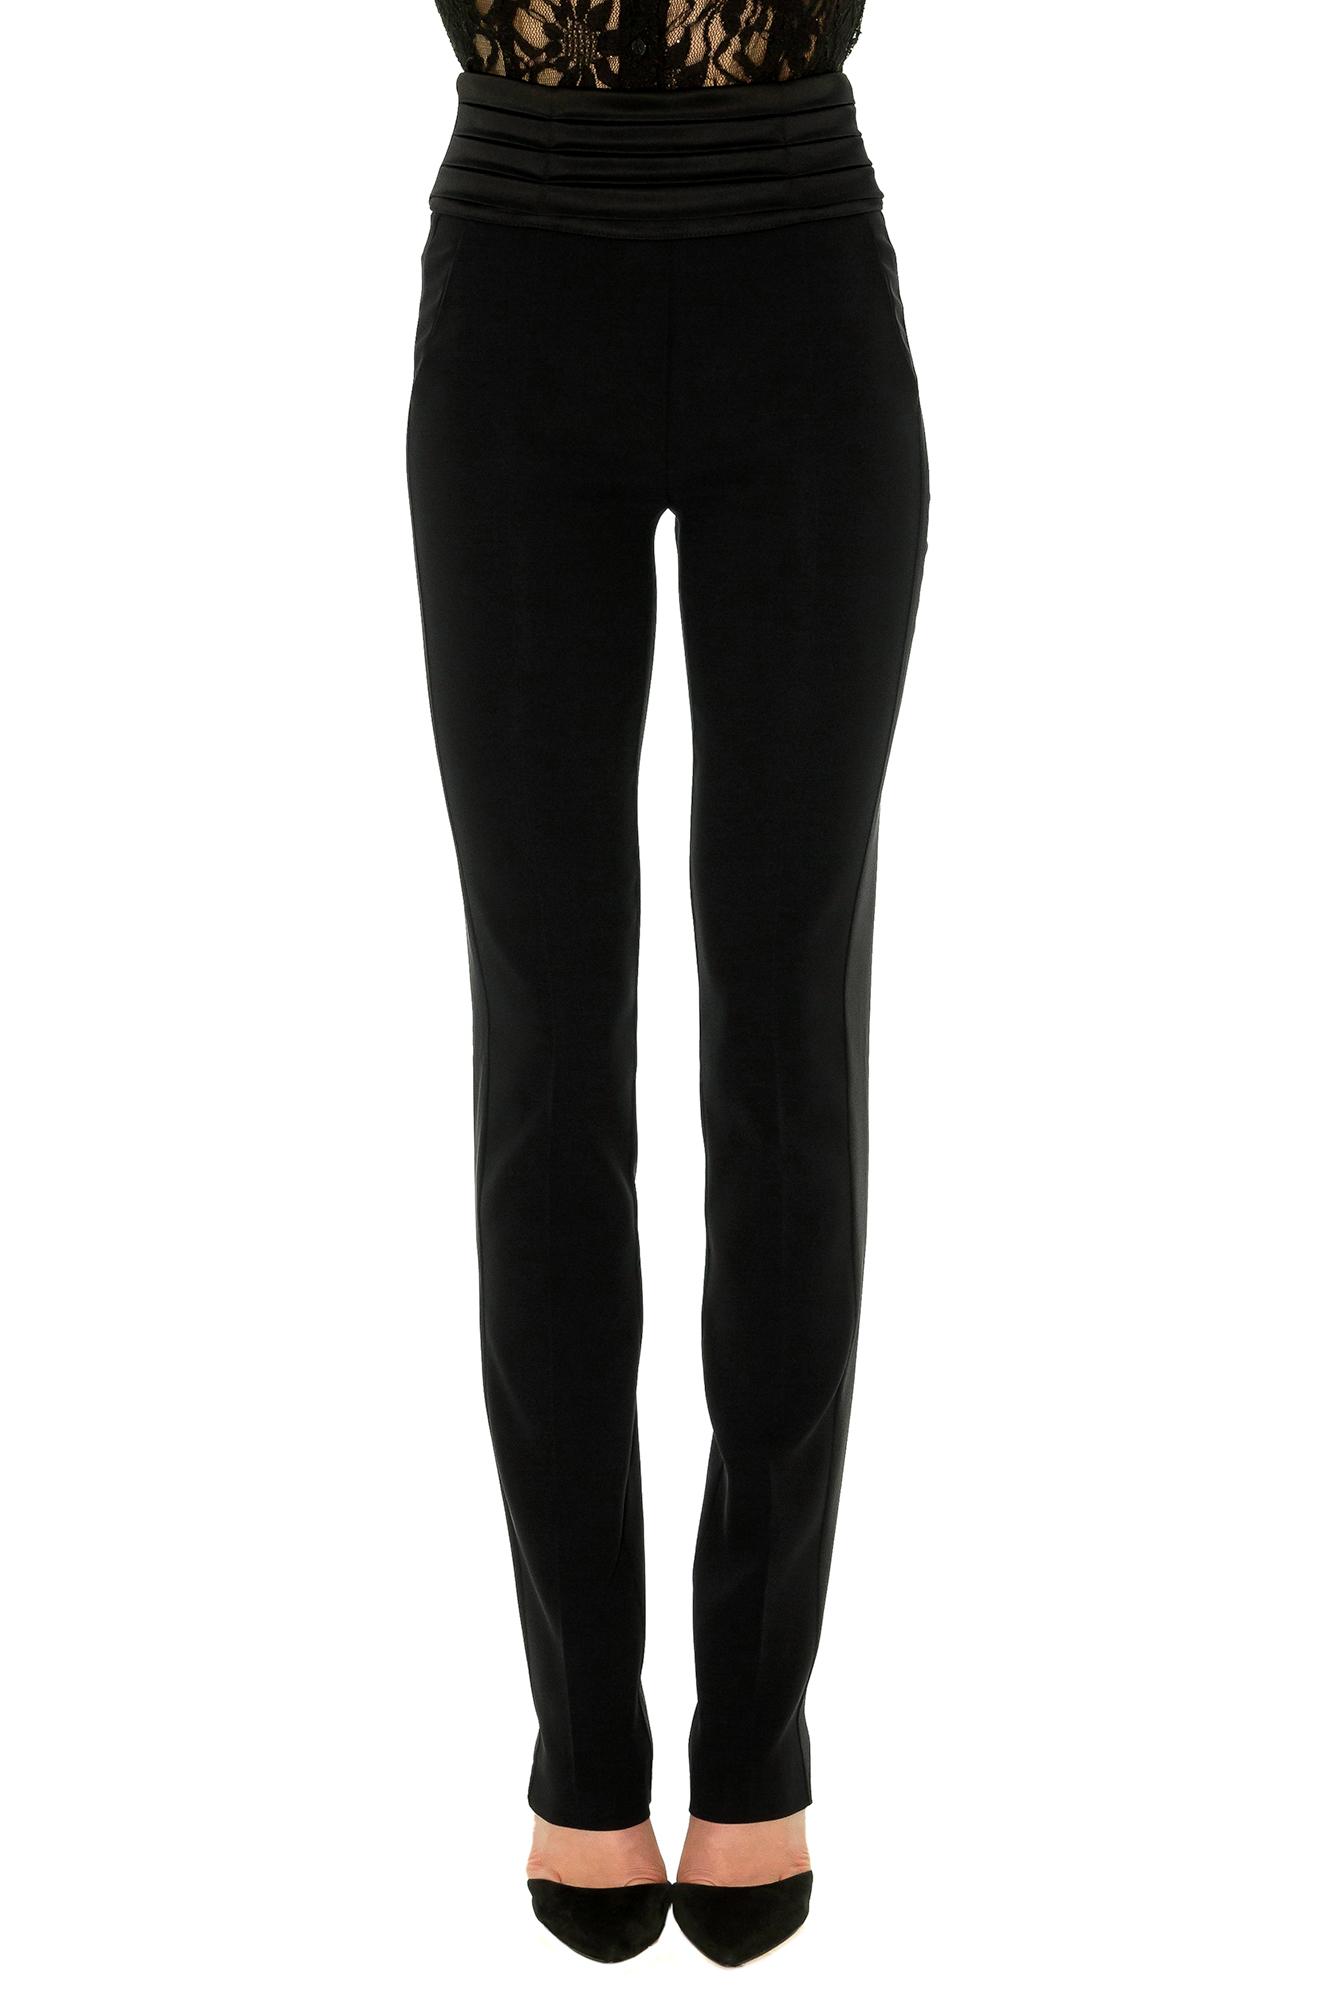 smoking femme noir pantalon taille haute ceinture. Black Bedroom Furniture Sets. Home Design Ideas